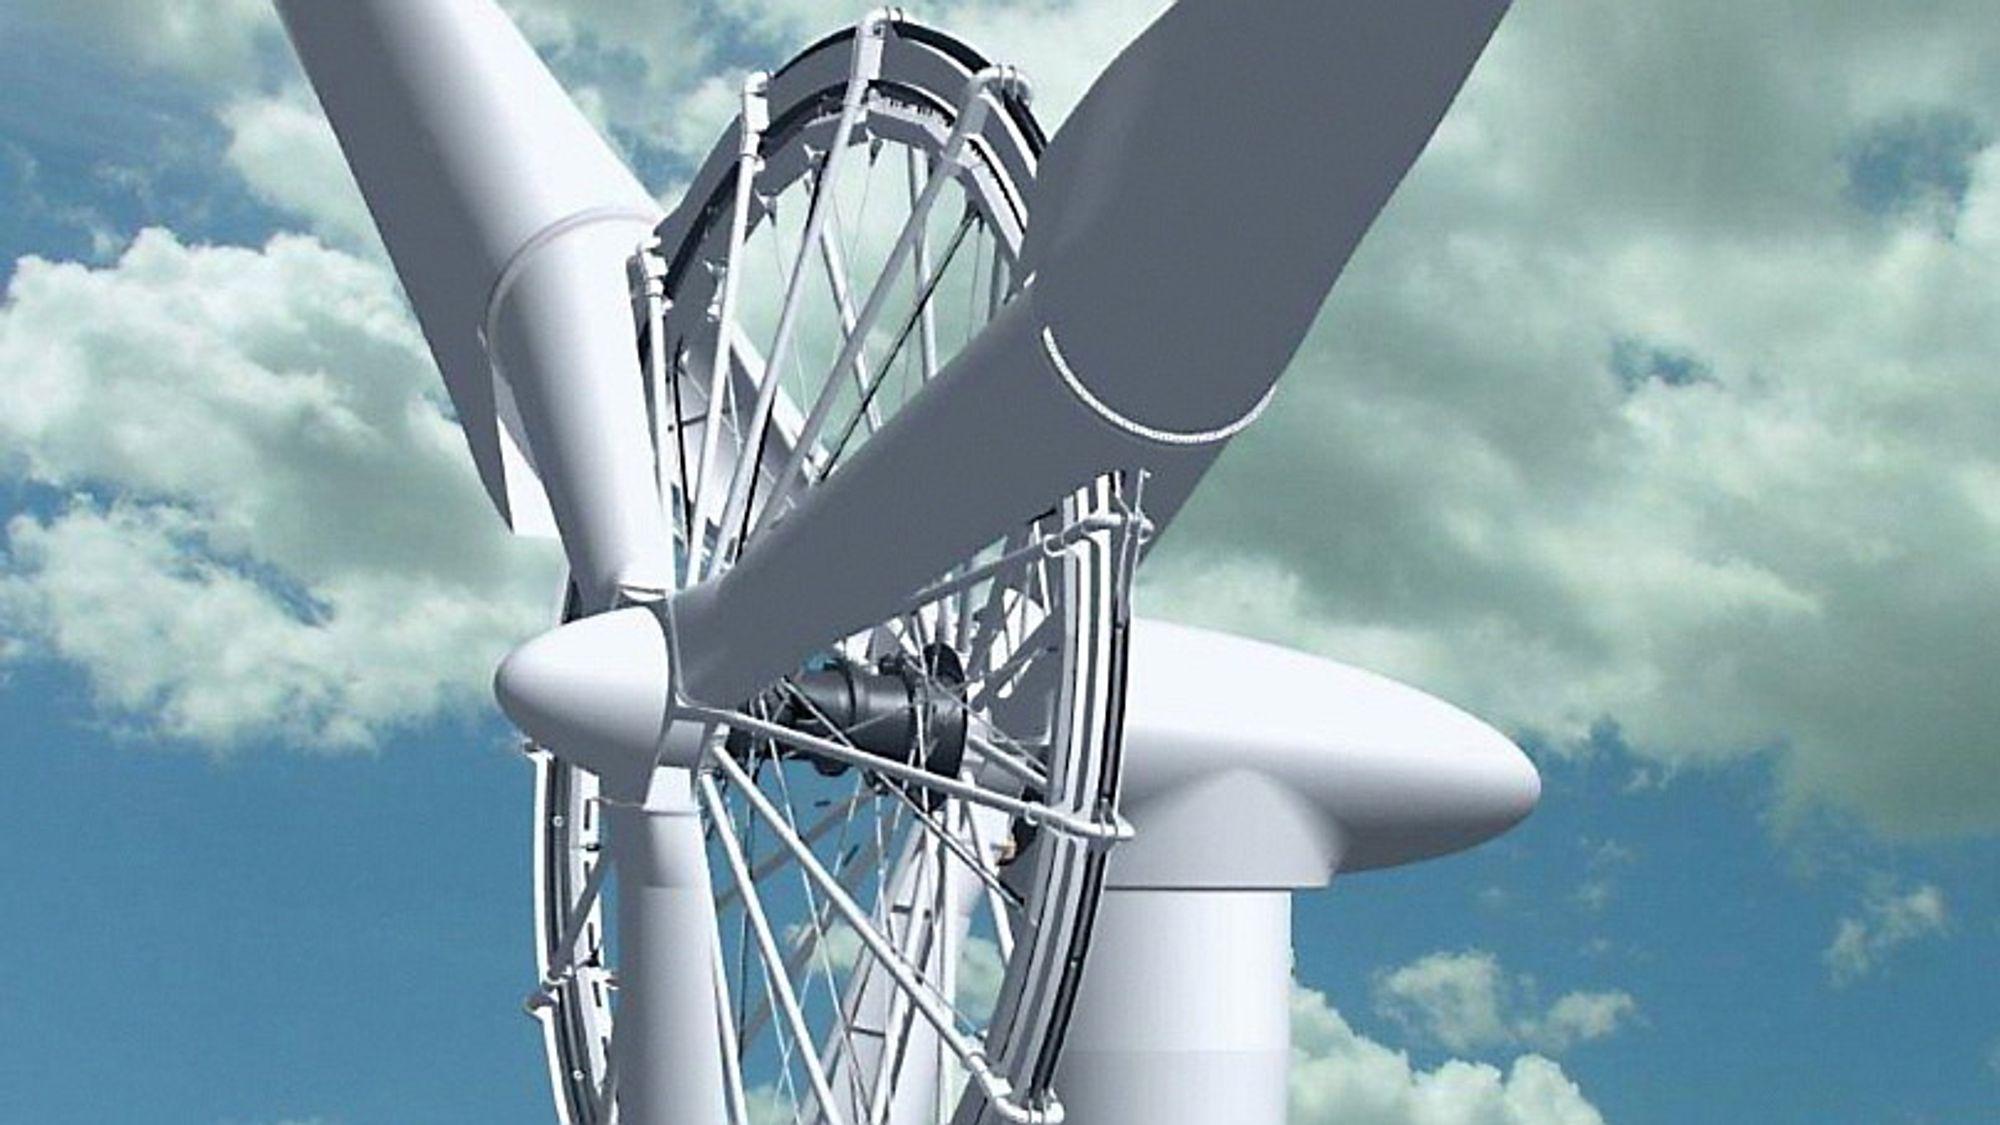 Det arrangeres mange interessante kraft- og energimesser i 2013.